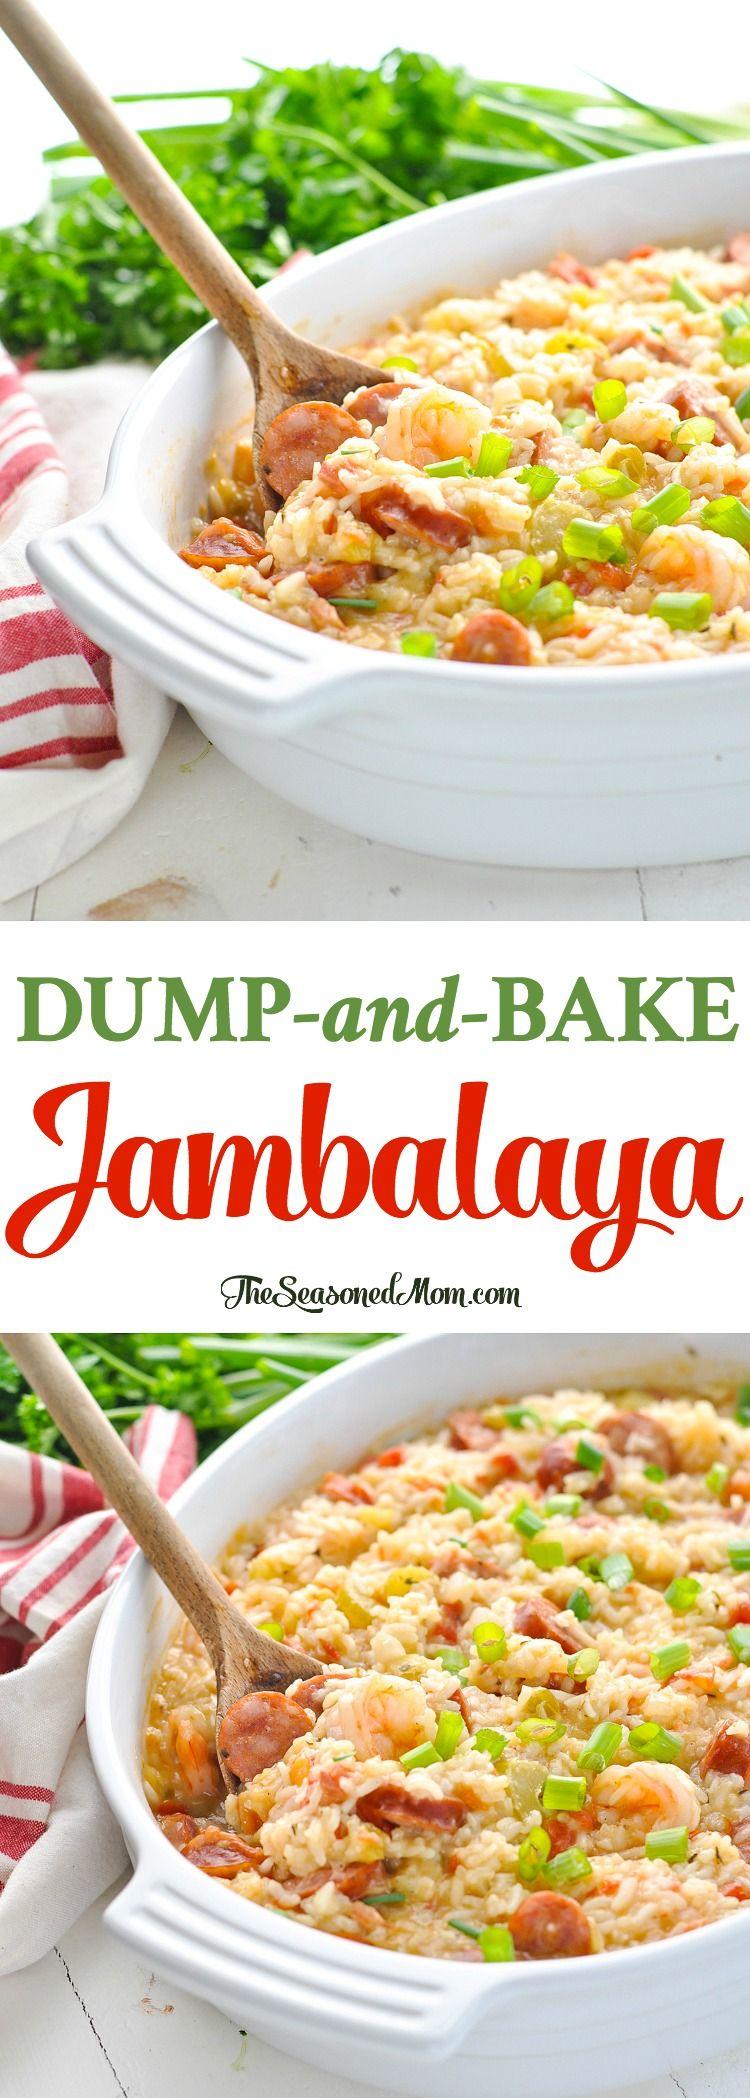 Dump-and-Bake Jambalaya #easyshrimprecipes